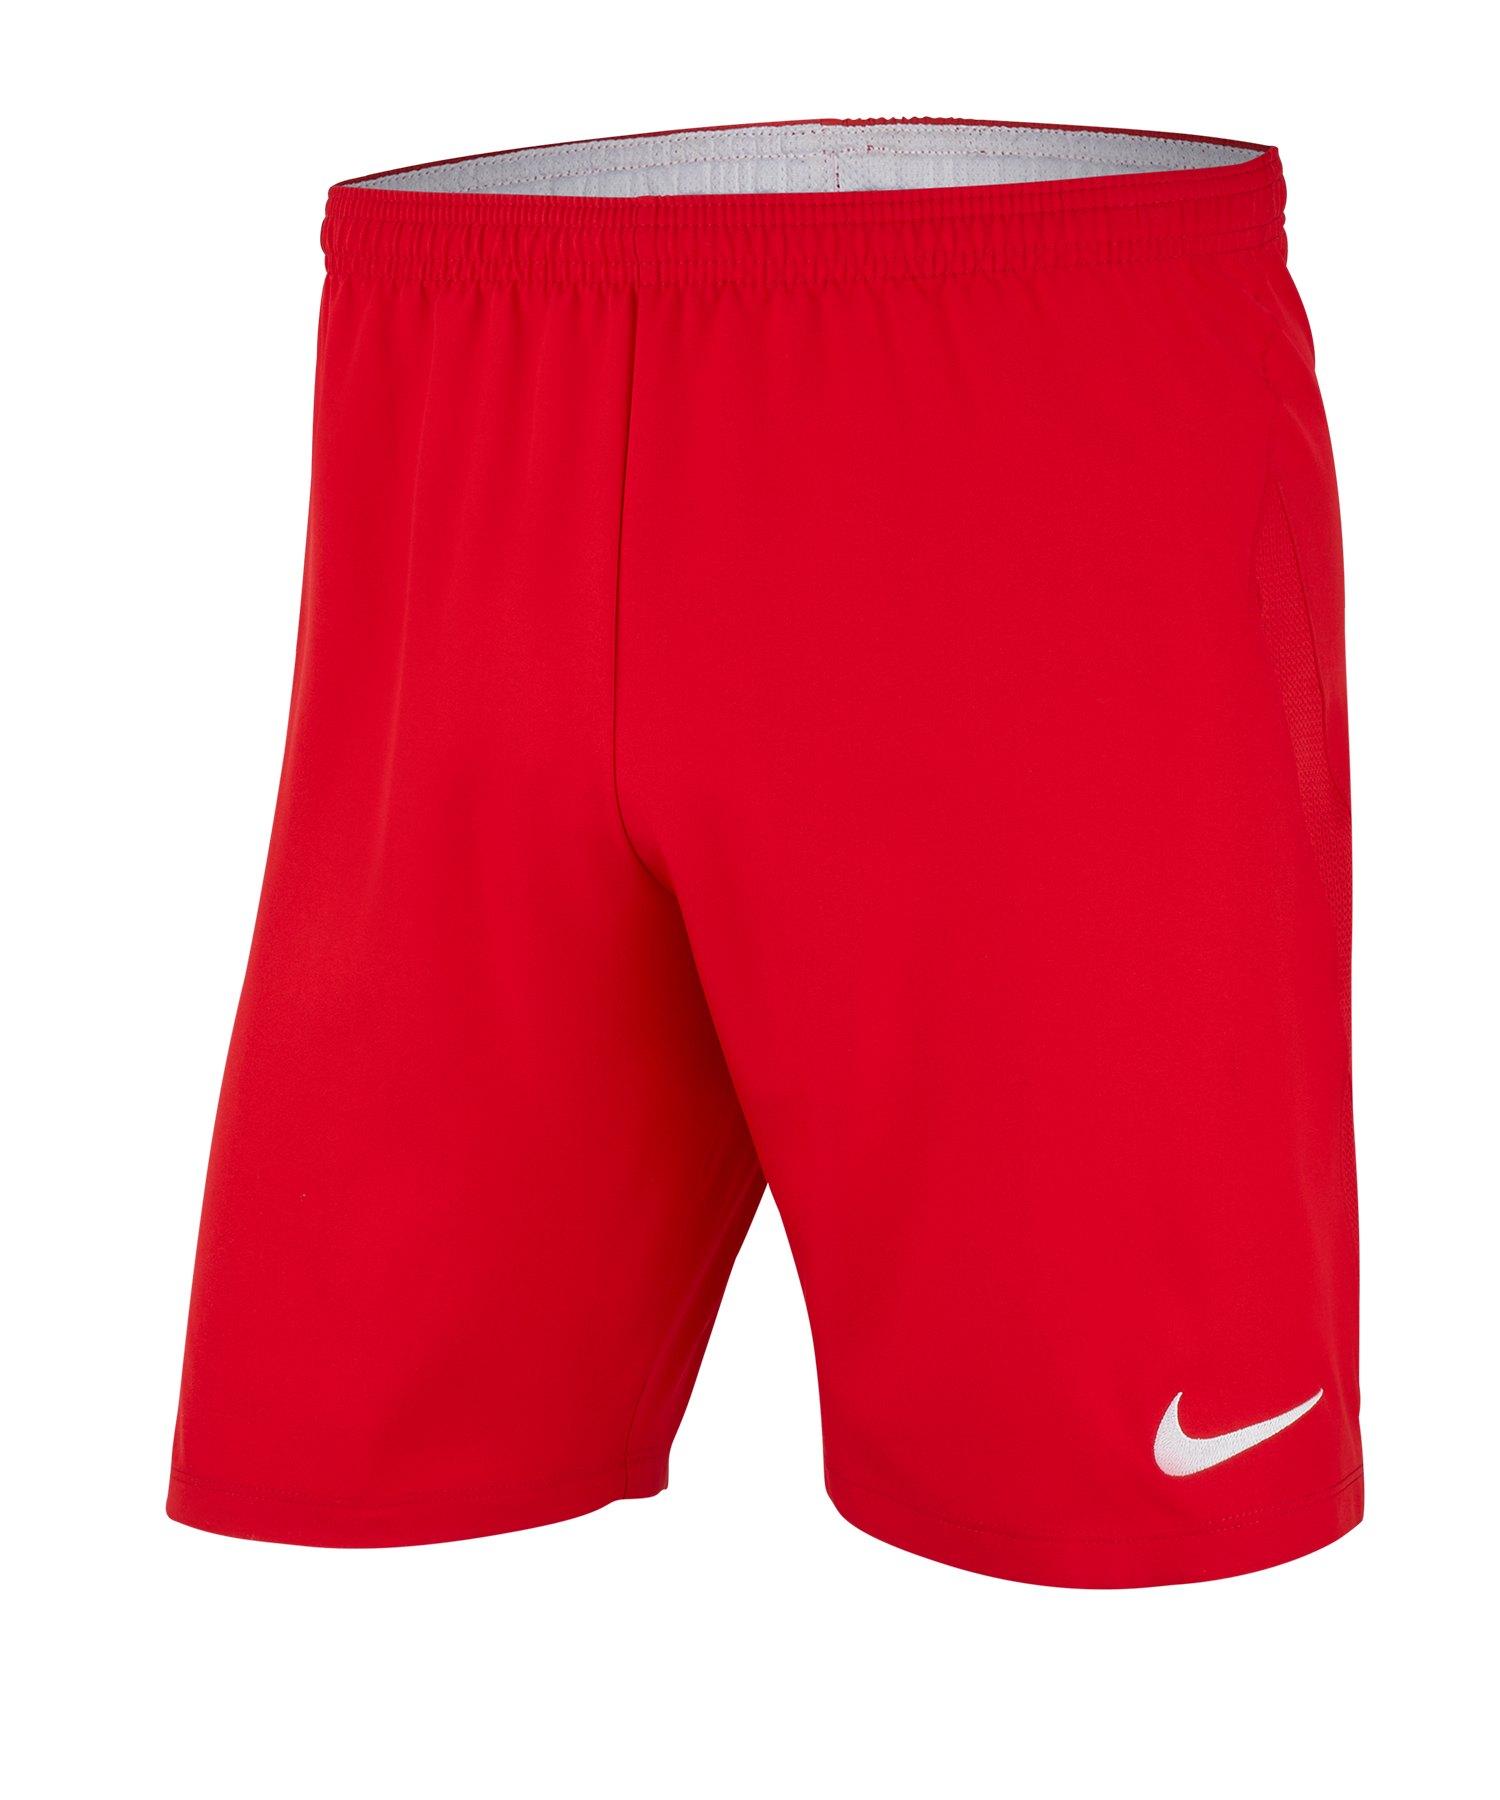 Nike Laser IV Dri-FIT Short Kids Rot F657 - rot